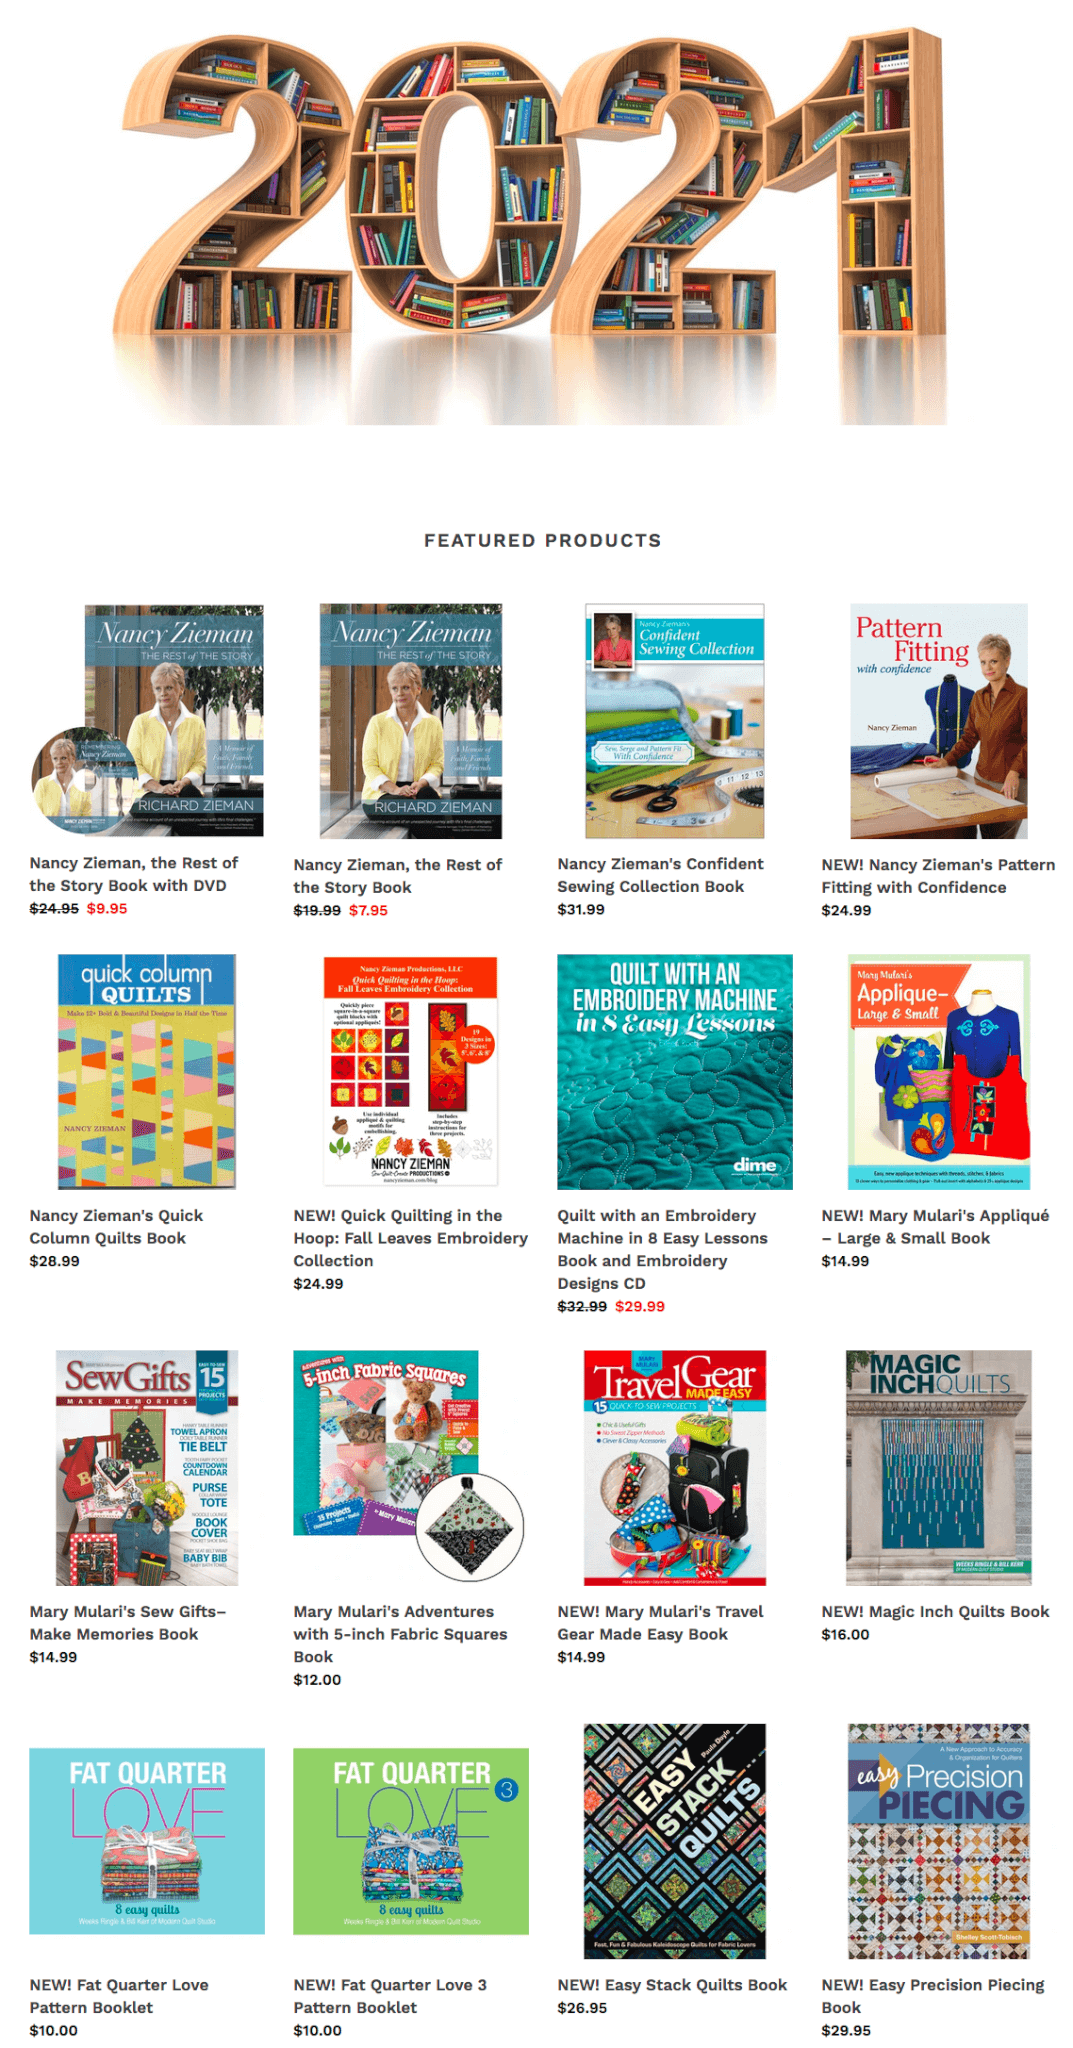 Visit ShopNZP.com to Purchase Nancy Zieman's Sewing Books